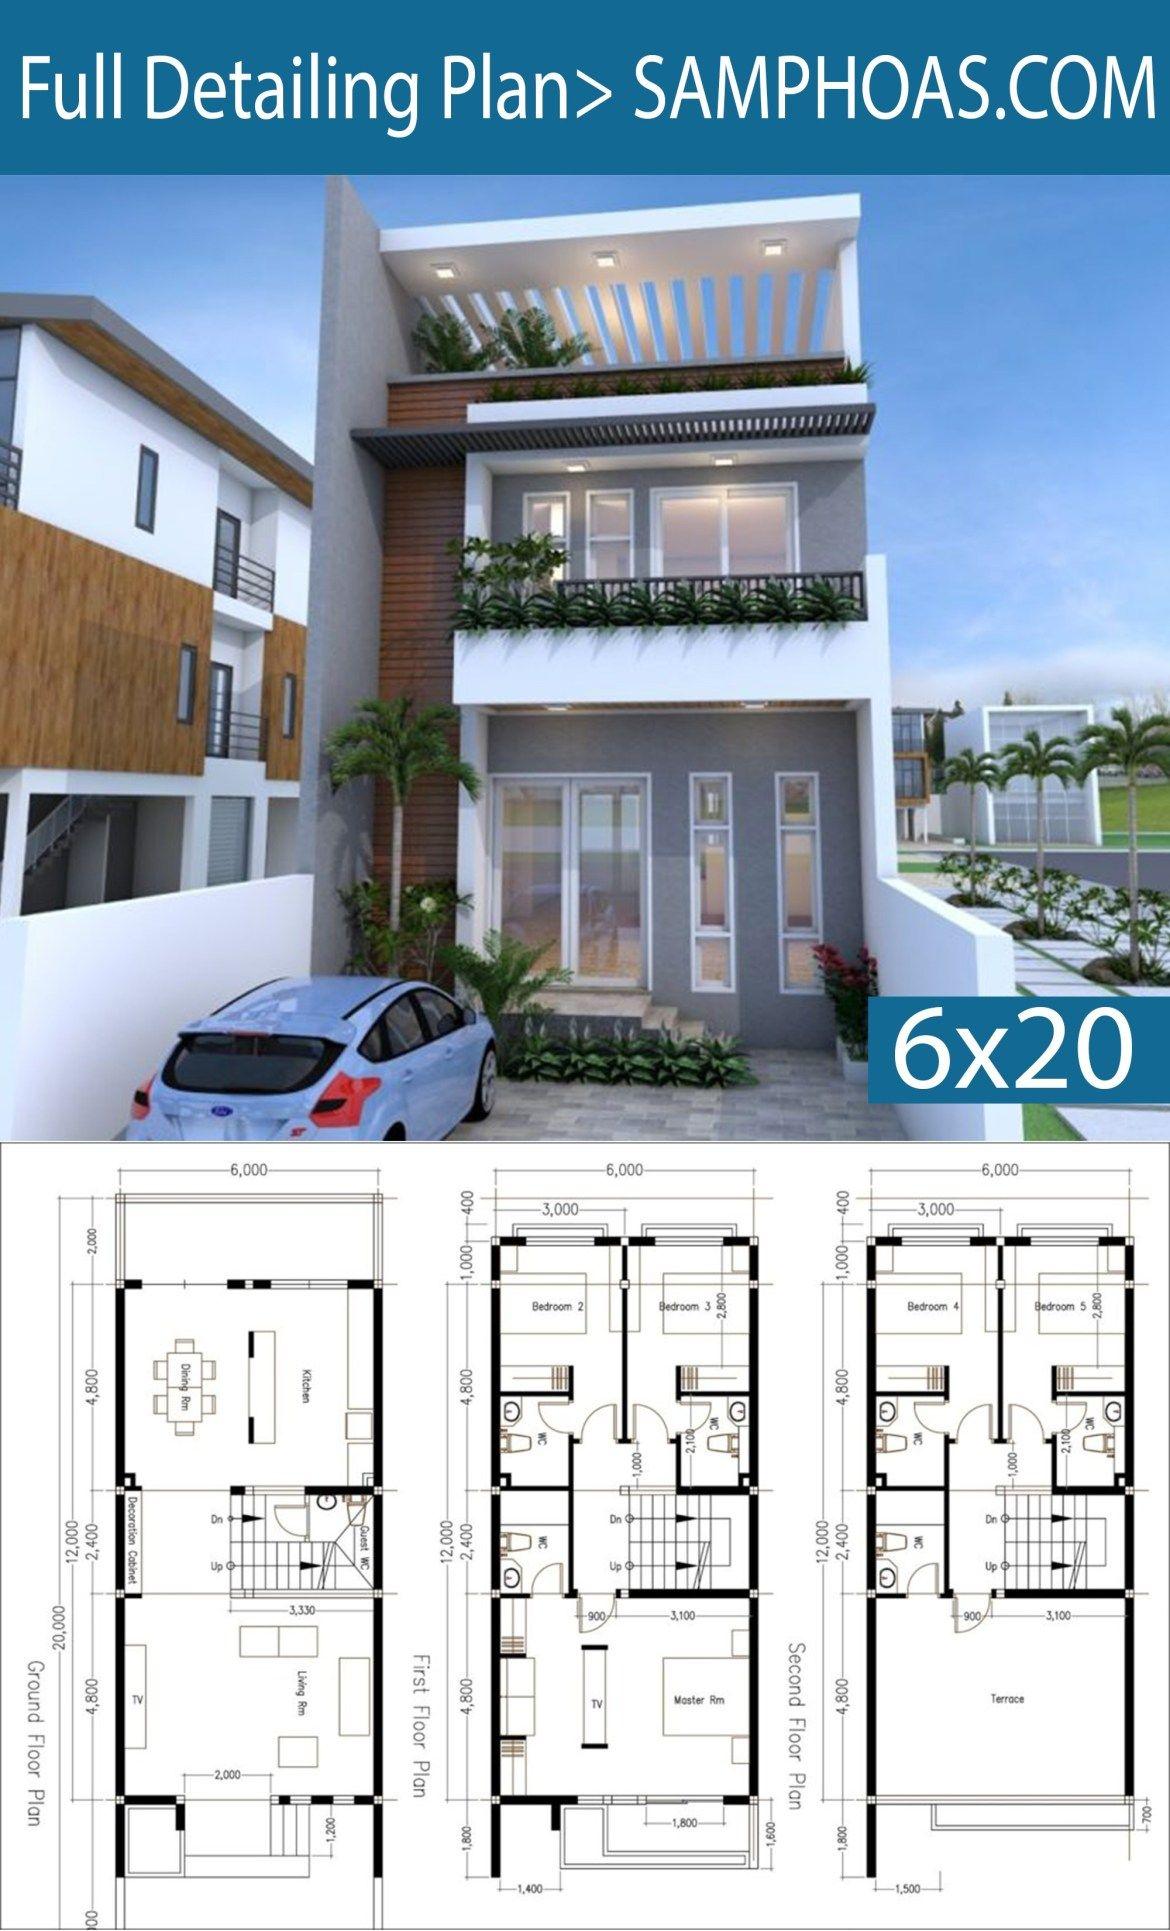 5 Bedrooms Modern Home Plan 6x12m Samphoas Plansearch Narrow House Plans Model House Plan Modern House Plans